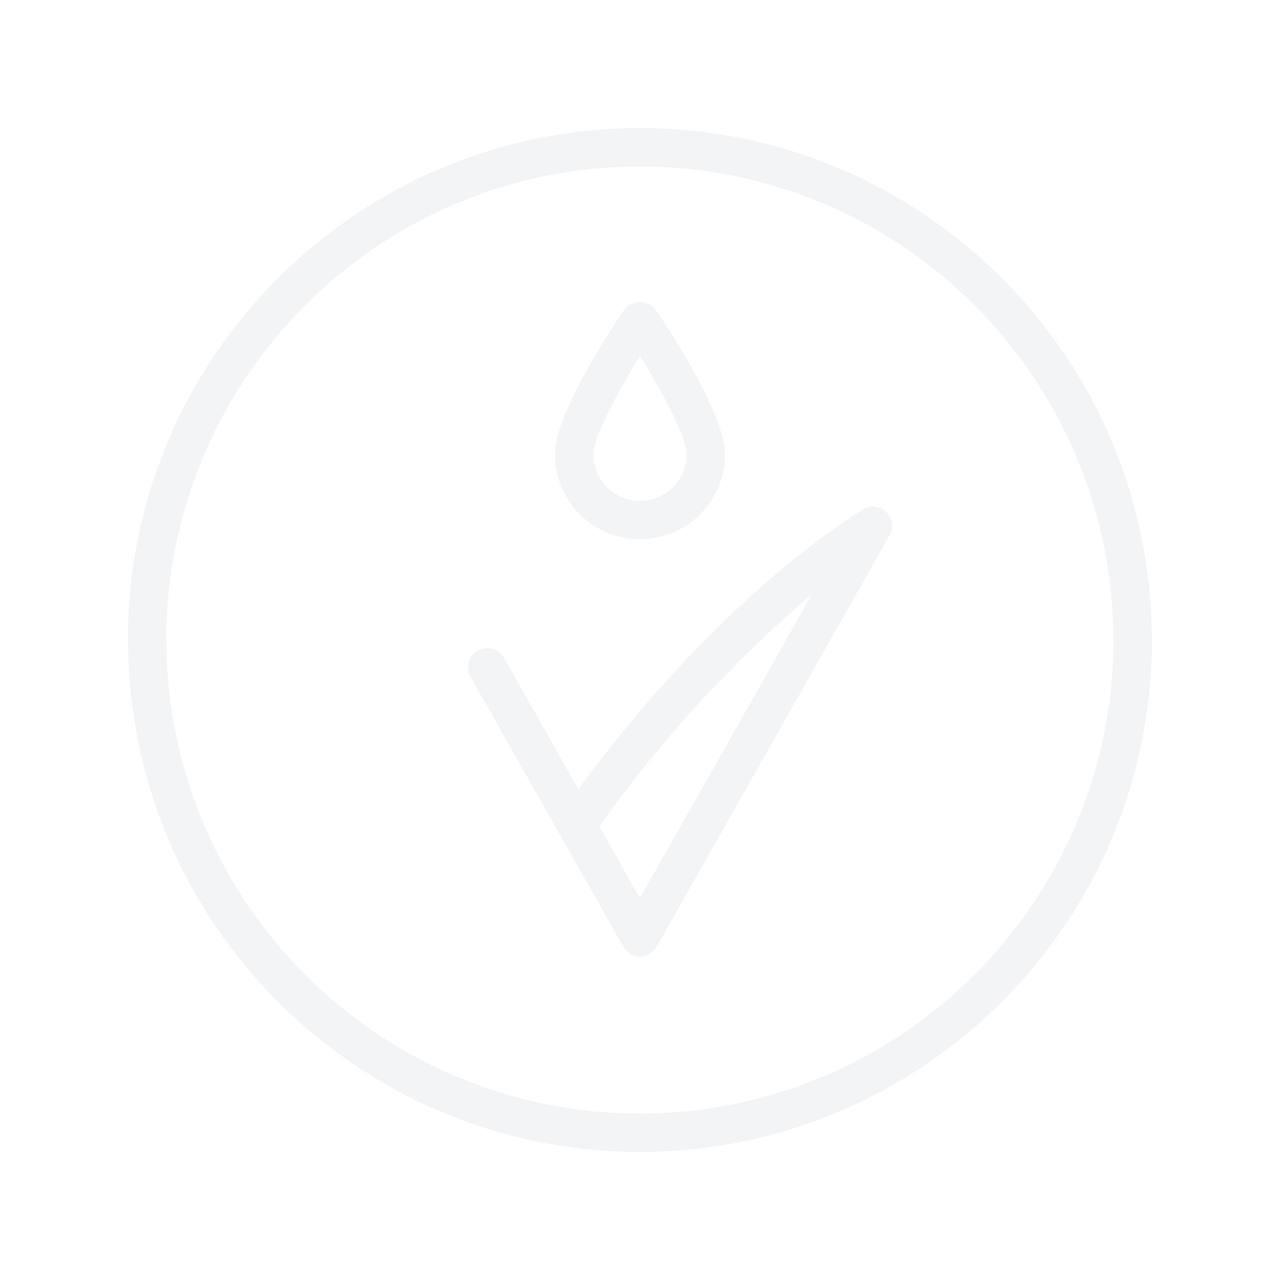 VICHY Homme 24h Ultra Refreshing Spray Deodorant 100ml